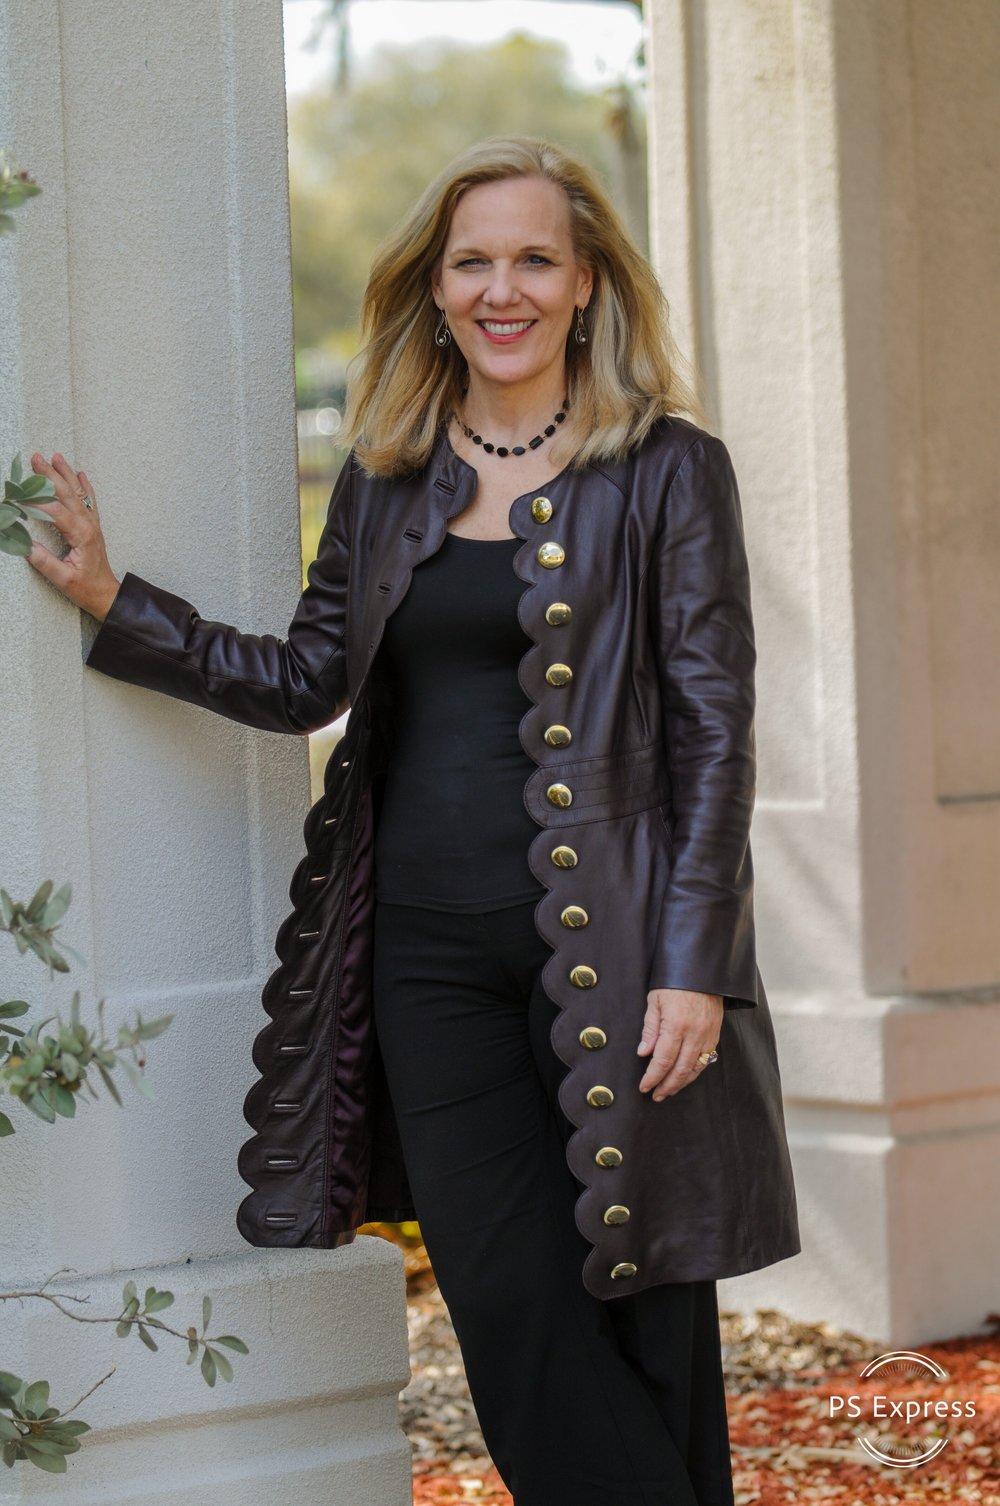 Kelly Harris - President & CEO